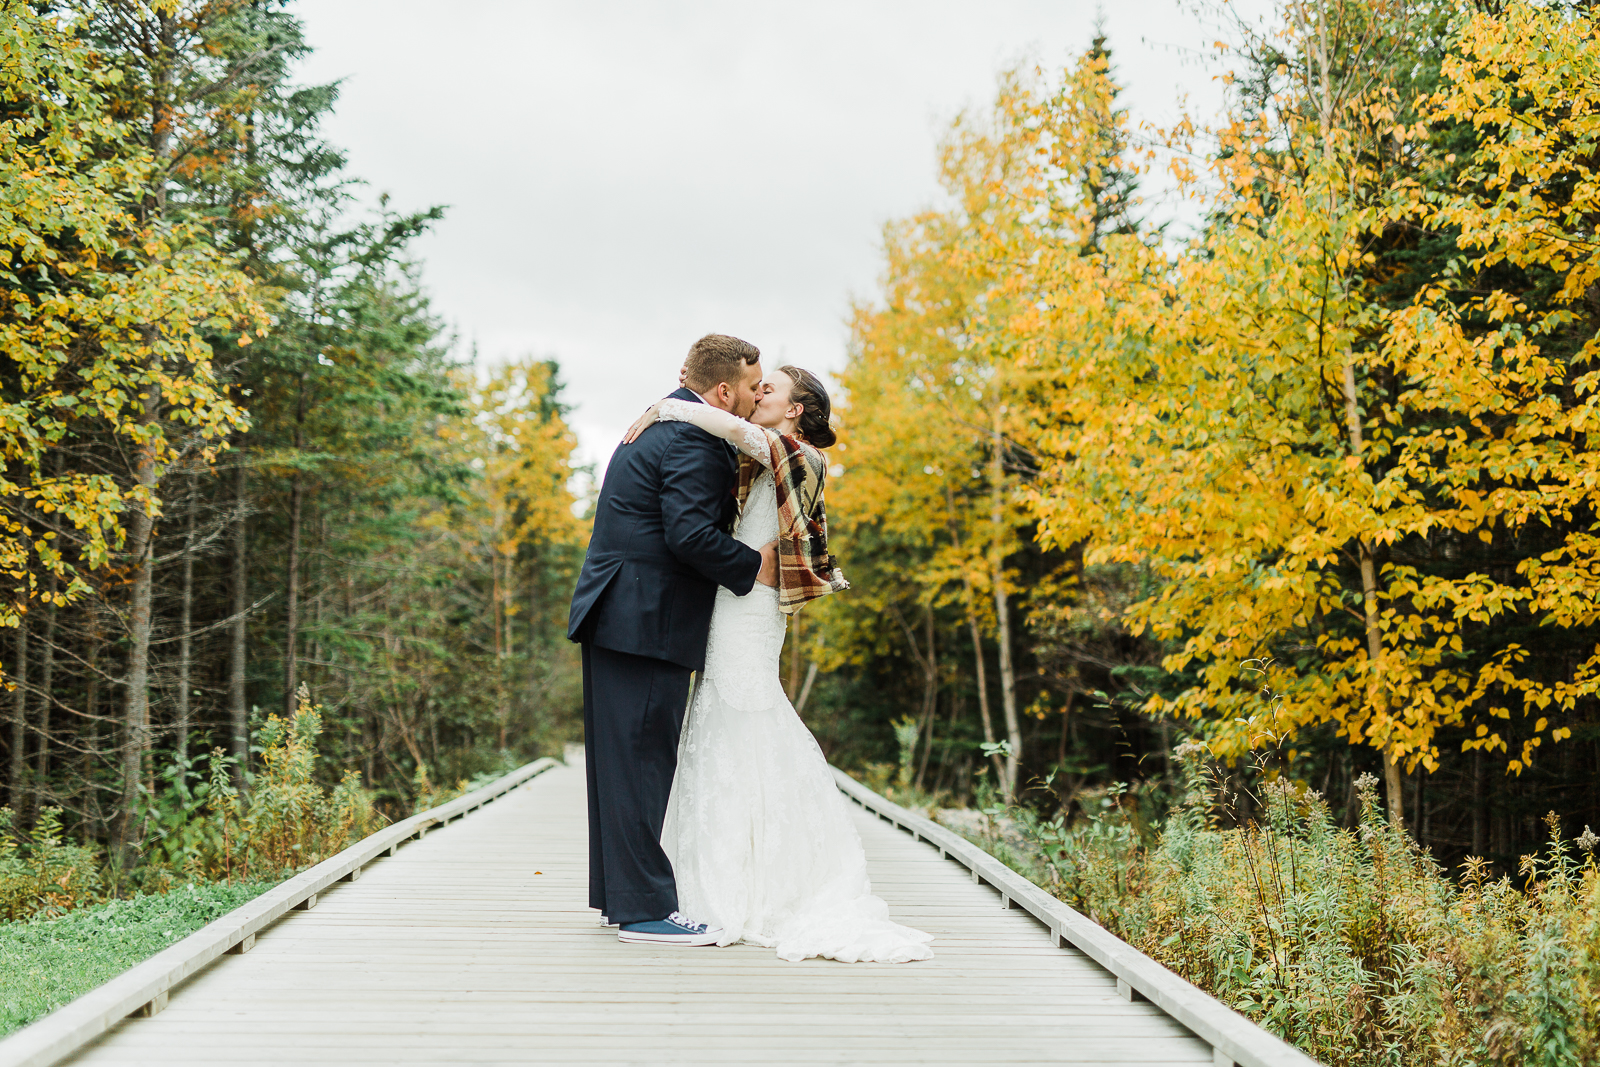 gander-wedding-photographer-88.jpg